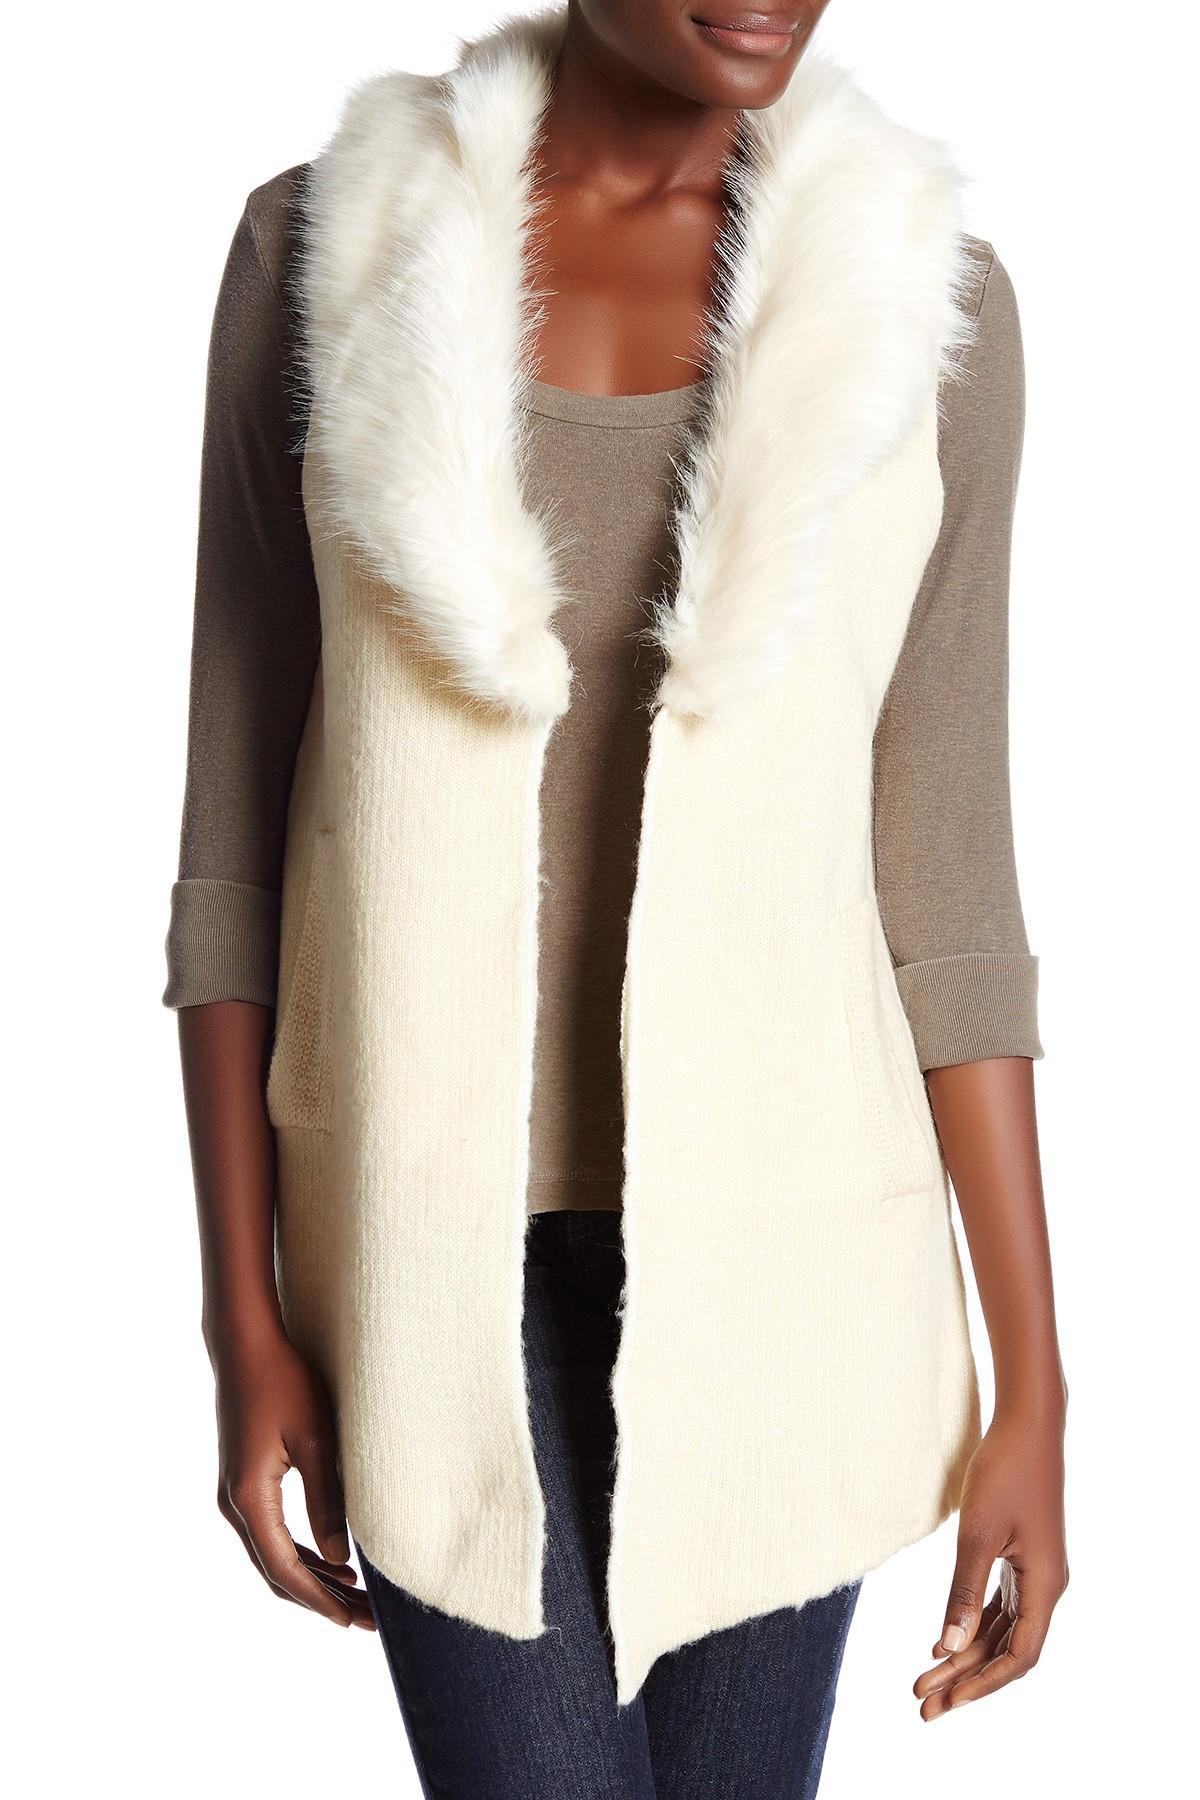 Cliche Faux Fur Collar Sleeveless Vest in Natural